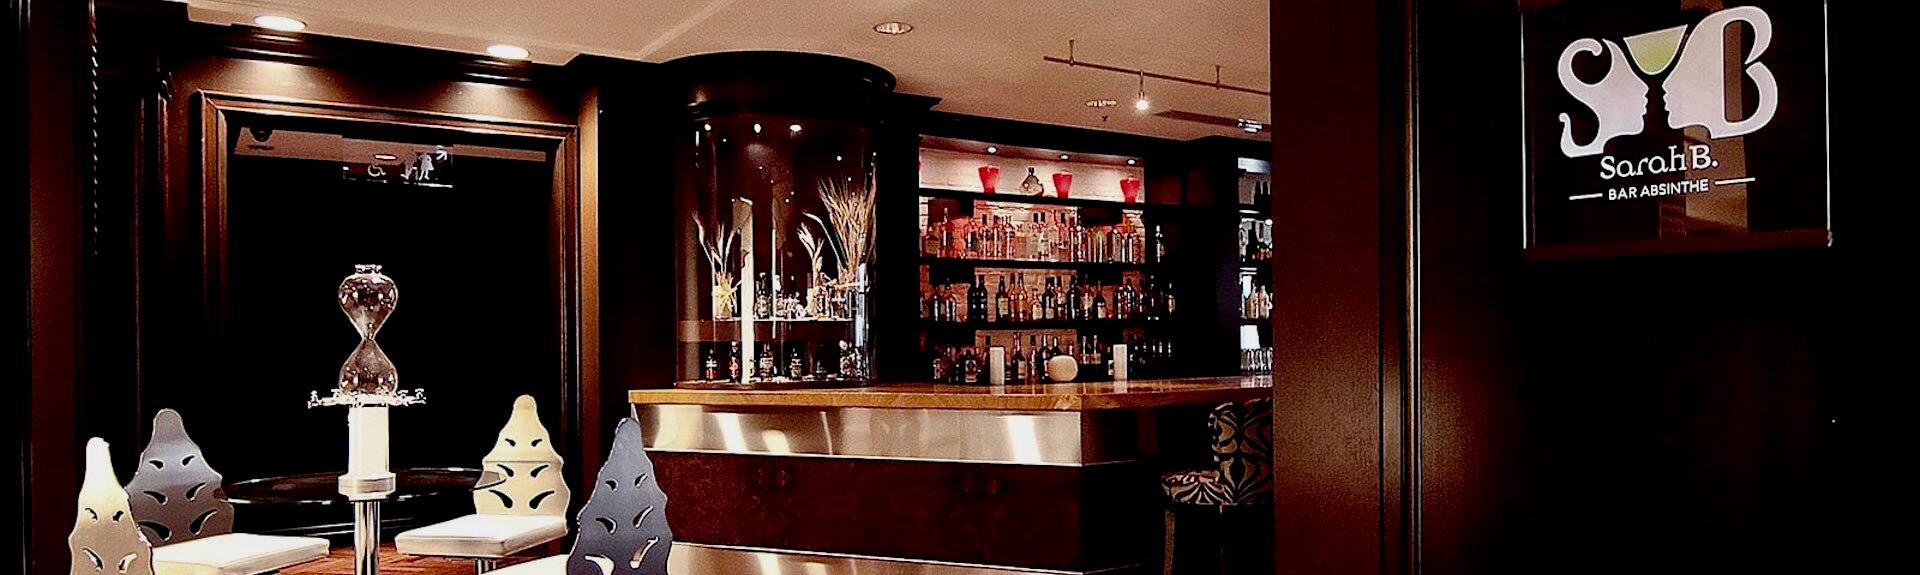 Vue intérieure du Bar Sarah B, Montréal, Québec